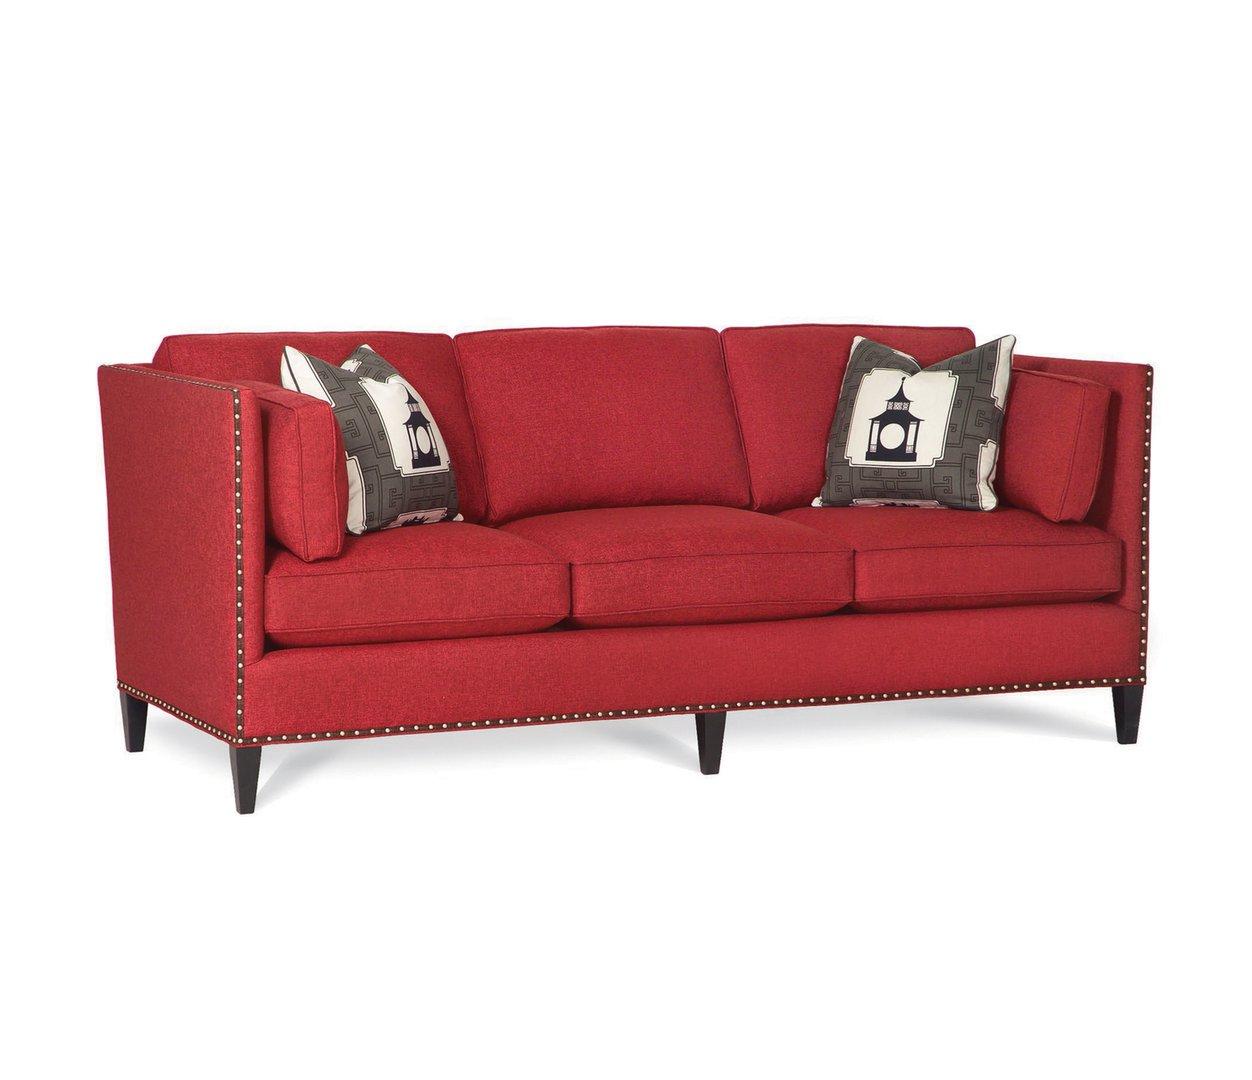 Beekman Sofa Image